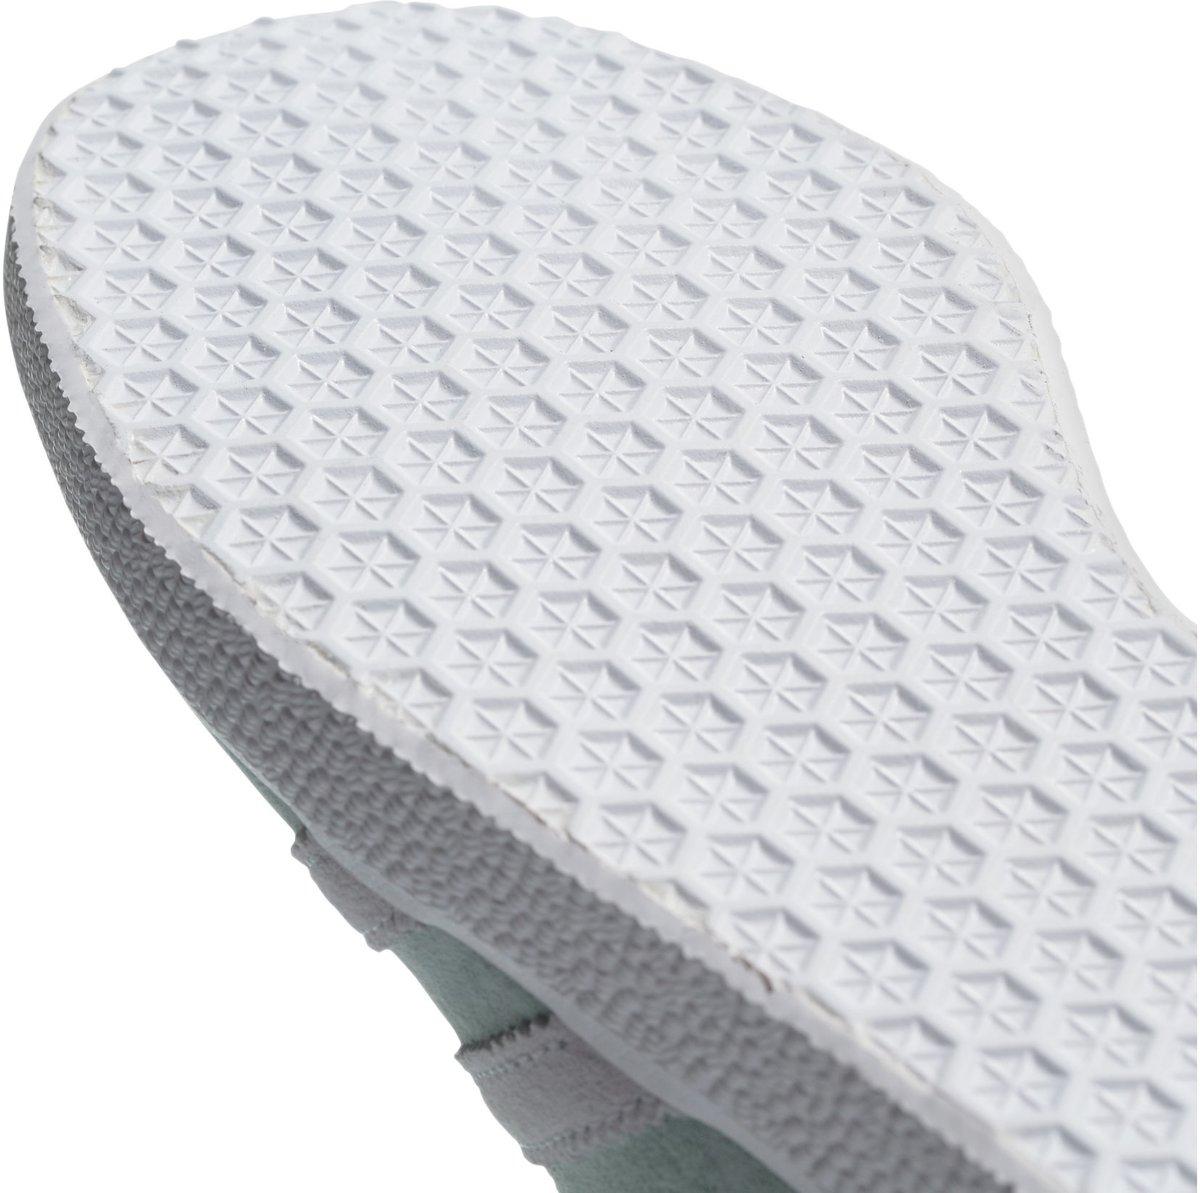 adidas originals SUPERSTAR 80s ftwr whiteECRU TINT S18